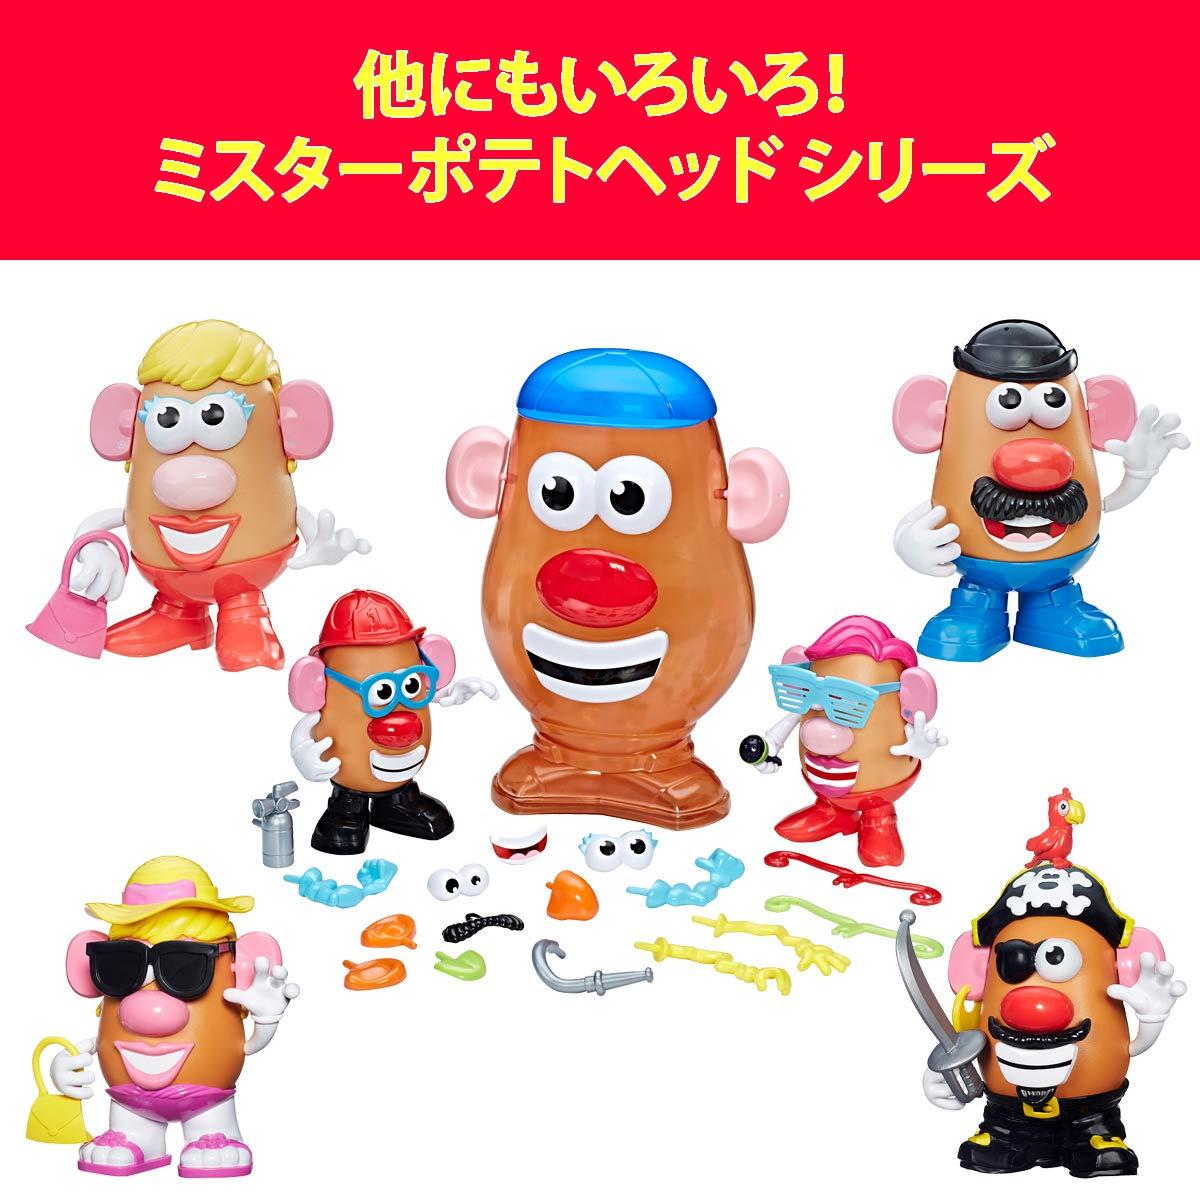 Mr. Potato Head Spud Set by HASBRO (Image #5)